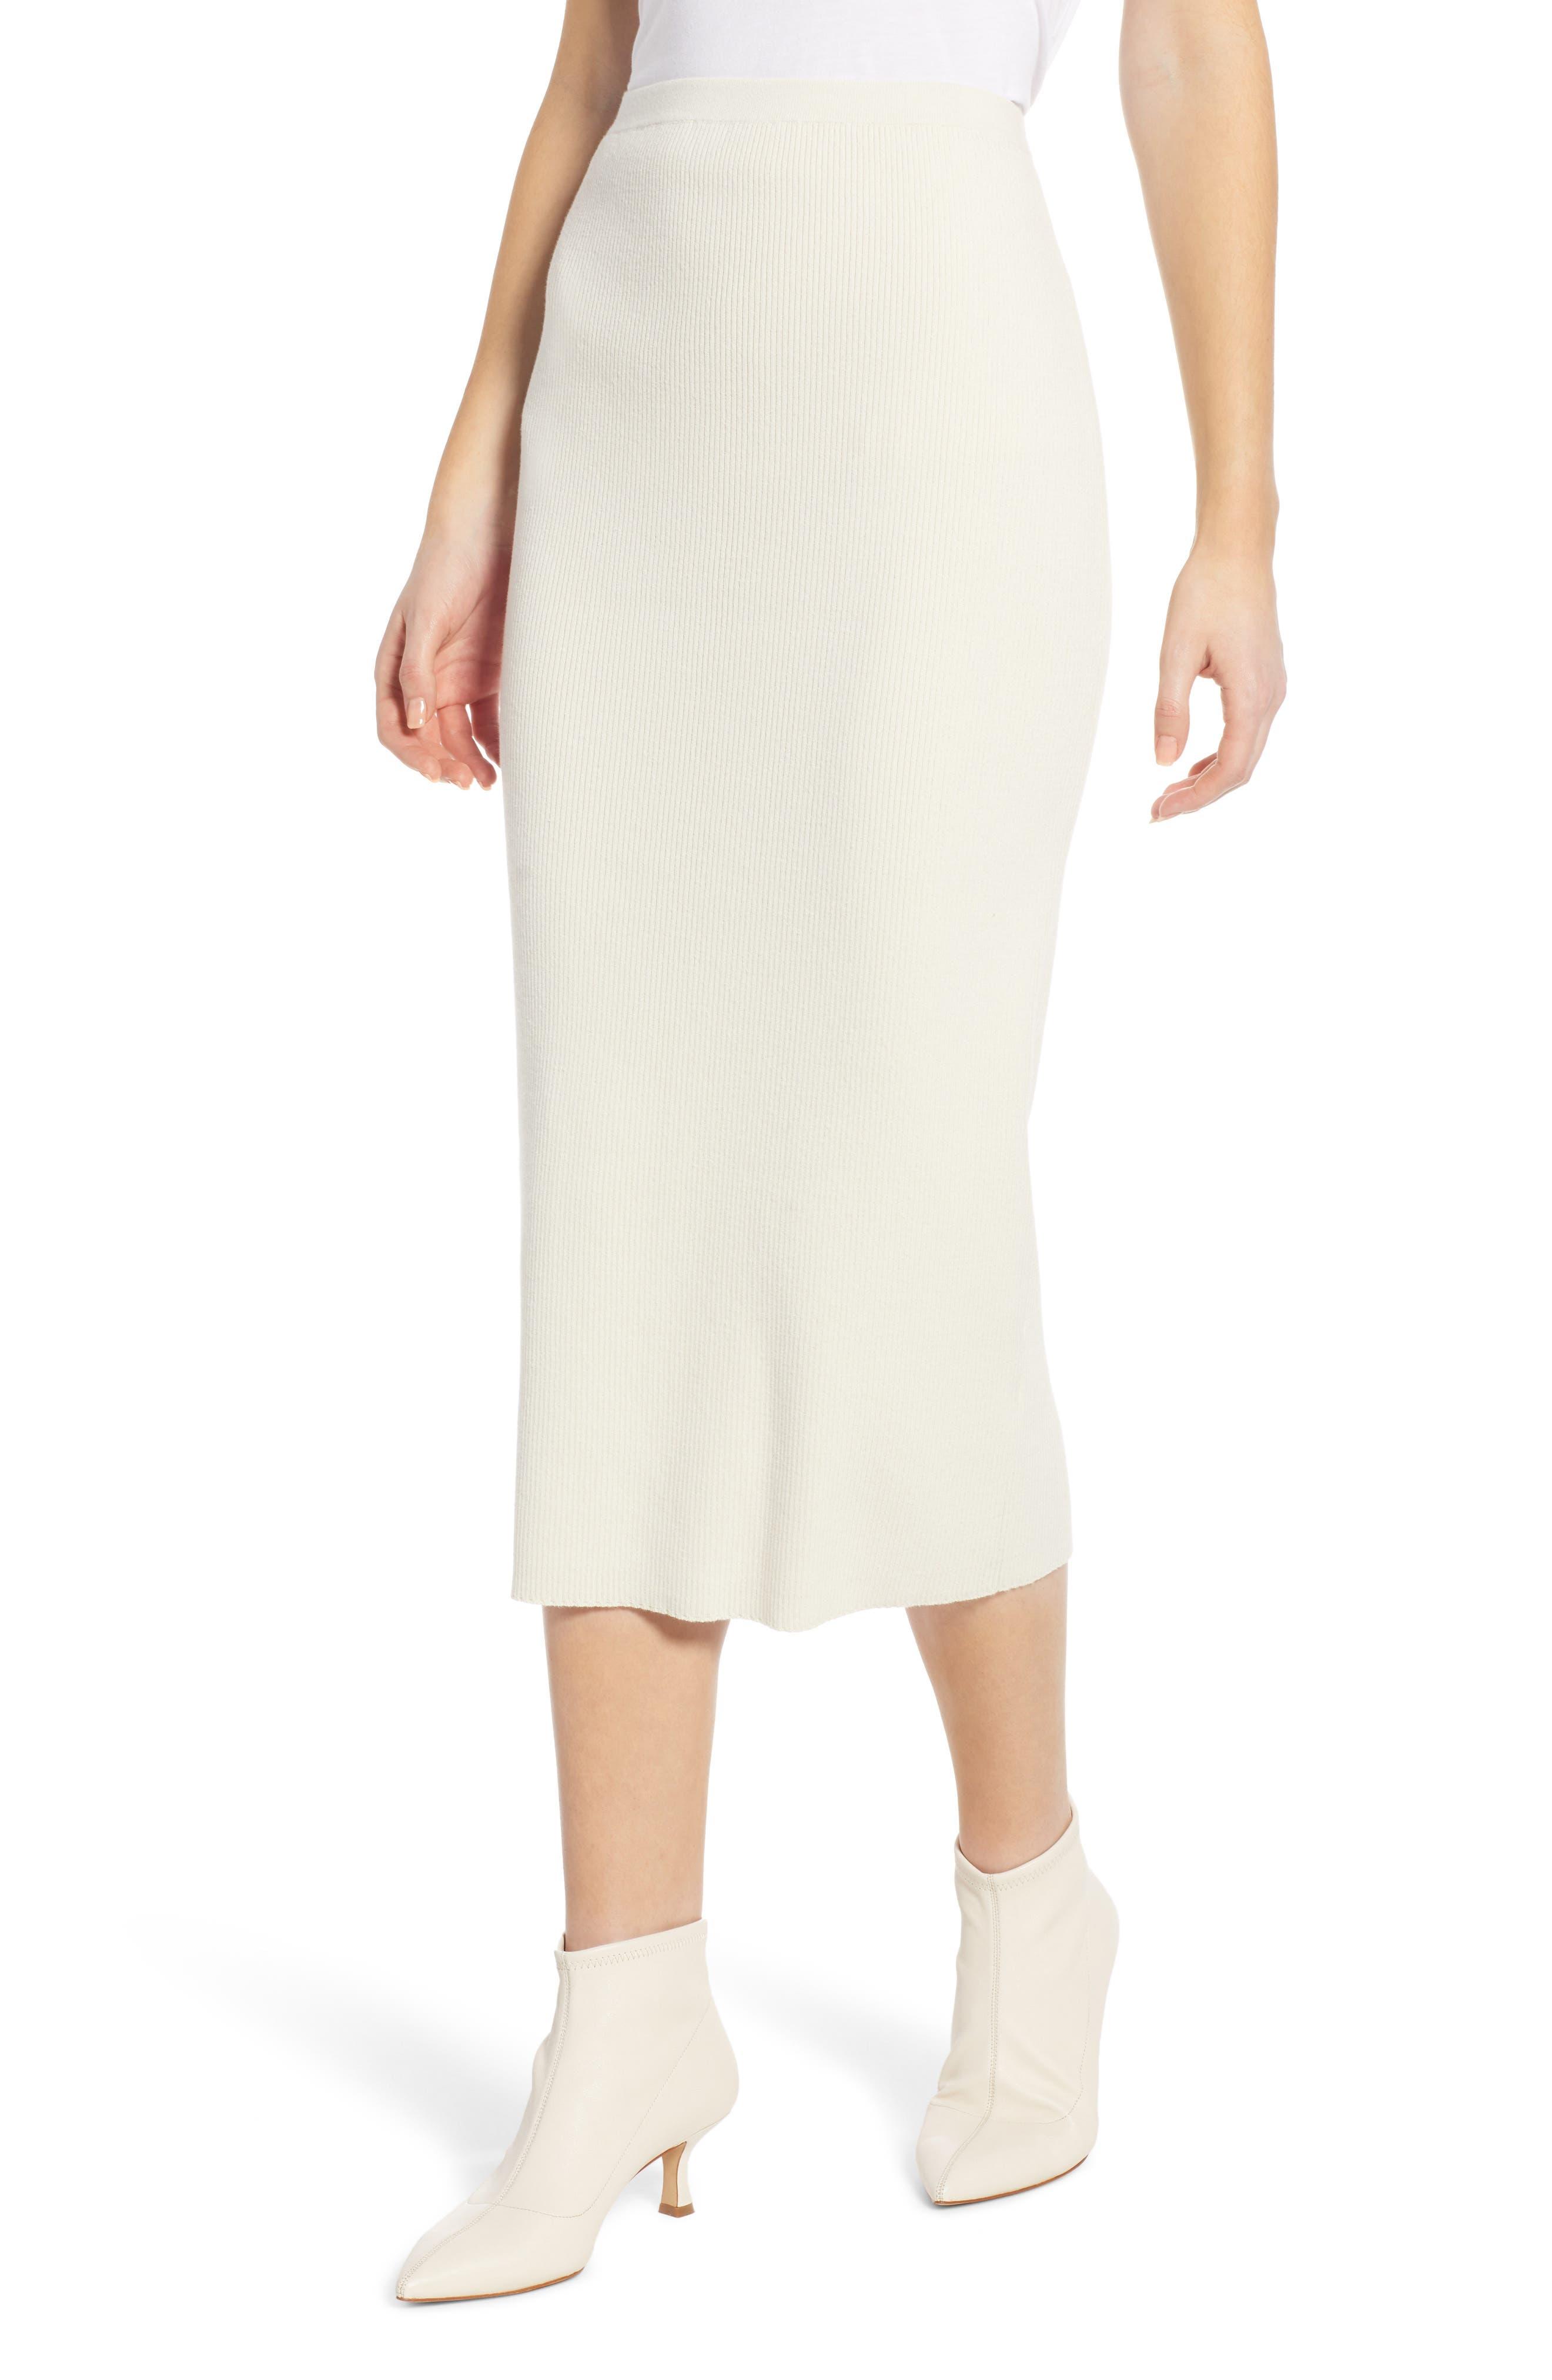 SOMETHING NAVY, Rib Sweater Midi Skirt, Main thumbnail 1, color, 900